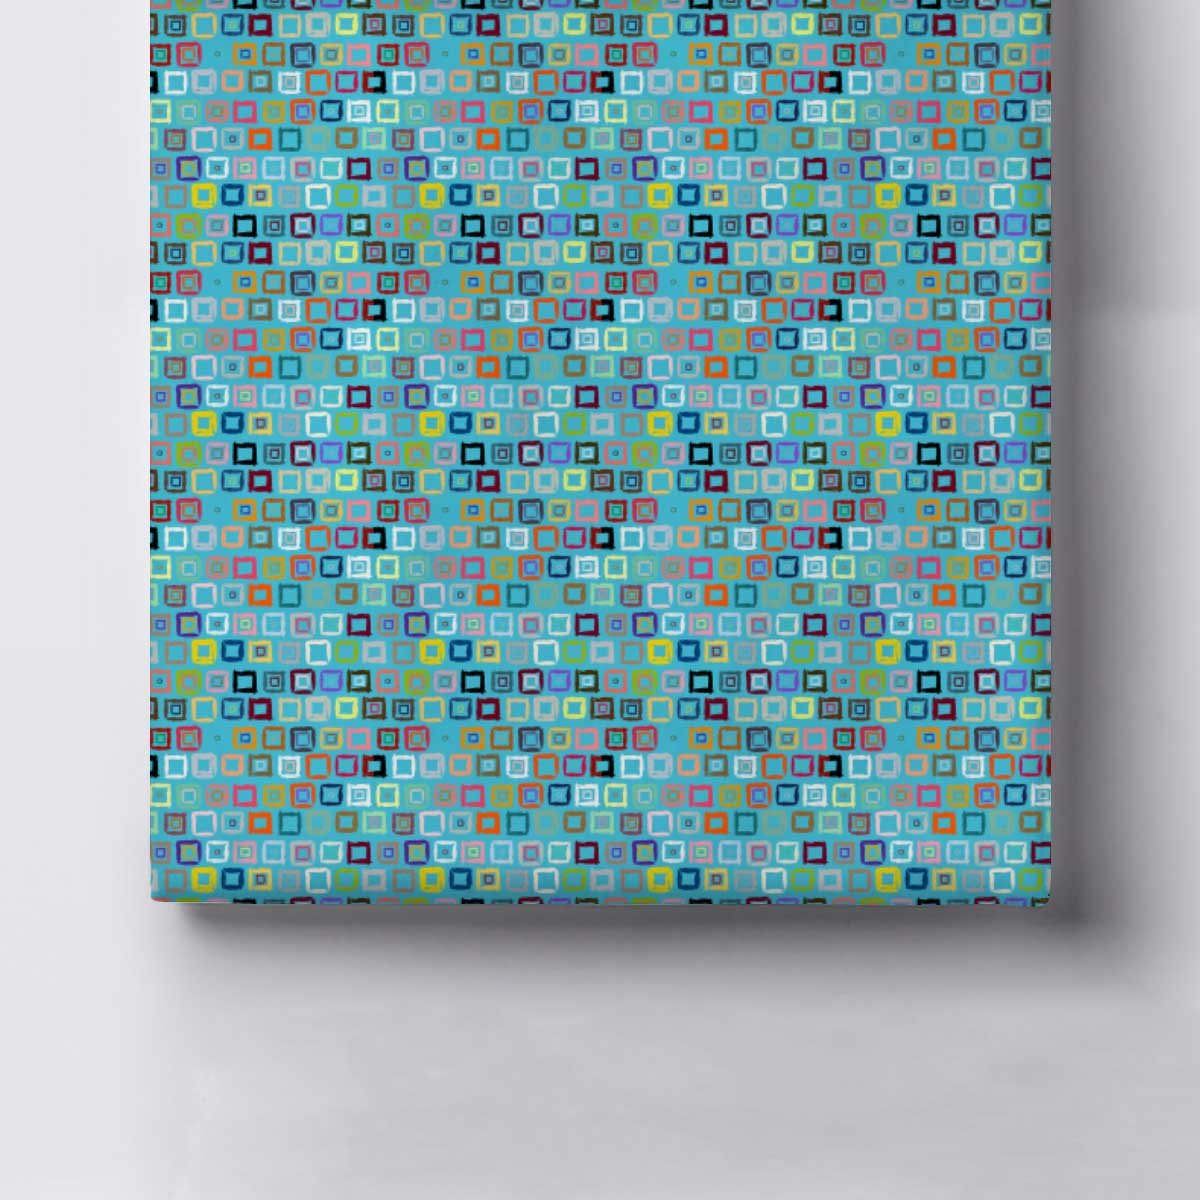 Amazon.com: artzfolio patrón geométrico tela de lona ...